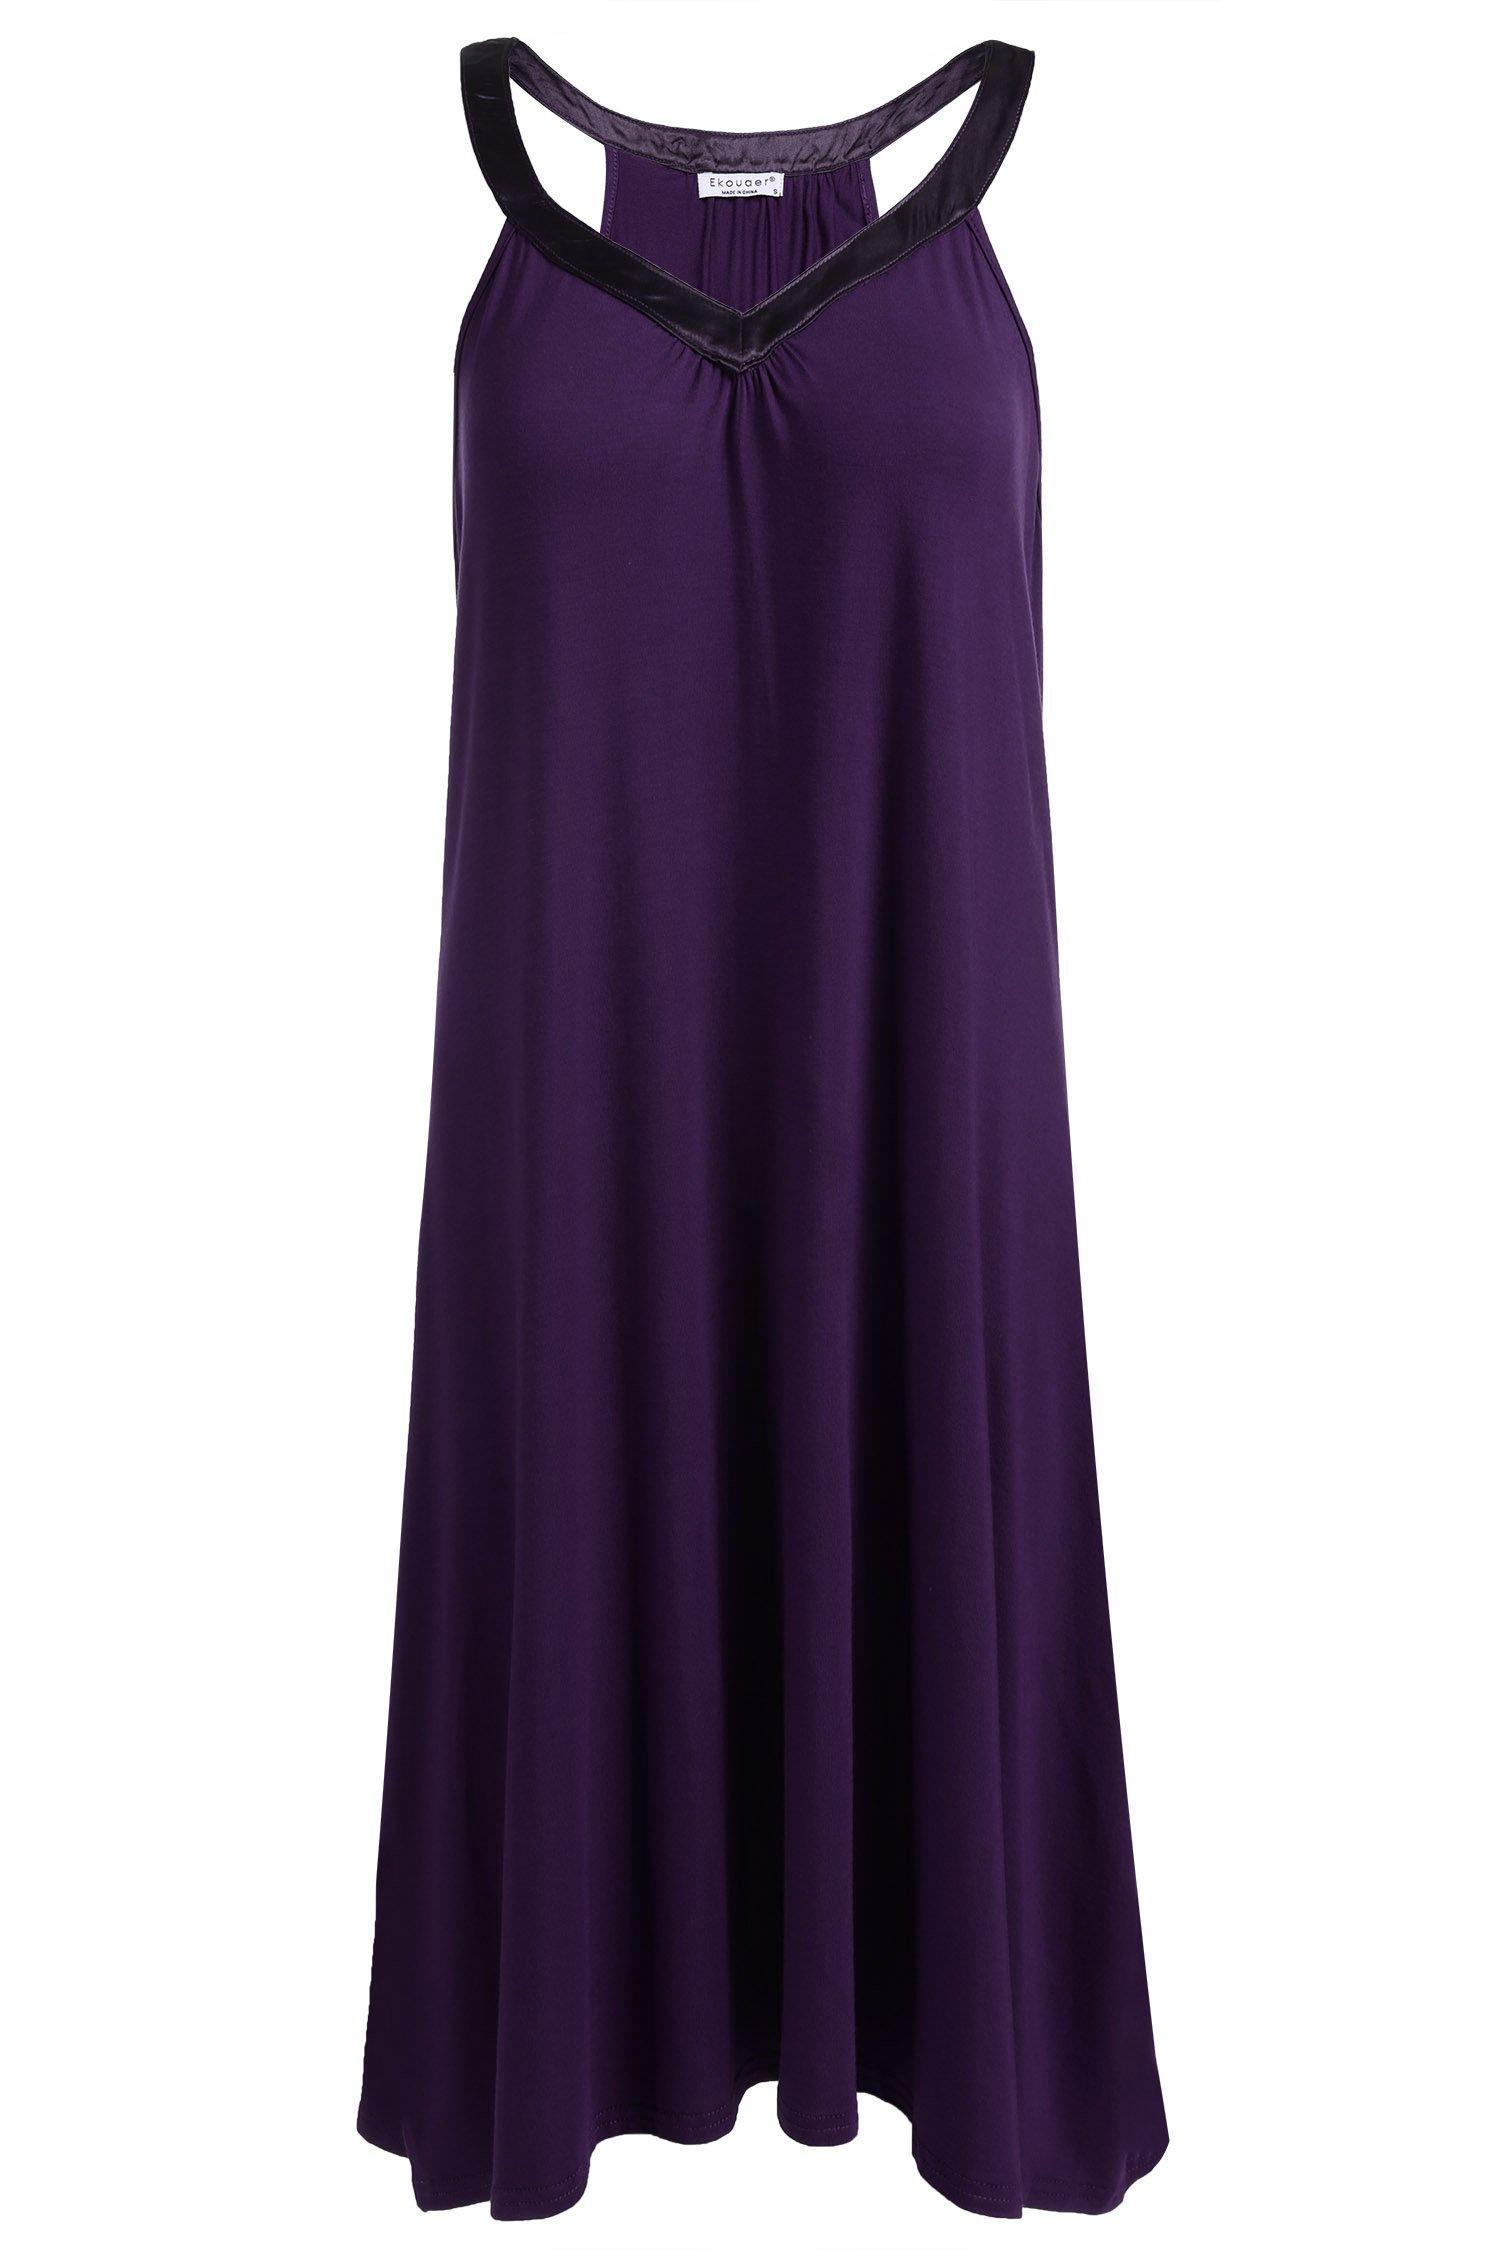 Ekouaer Womens Sleeveless Nightgown Sleepwear Summer Slip Night Dress (M, Purple-6095)